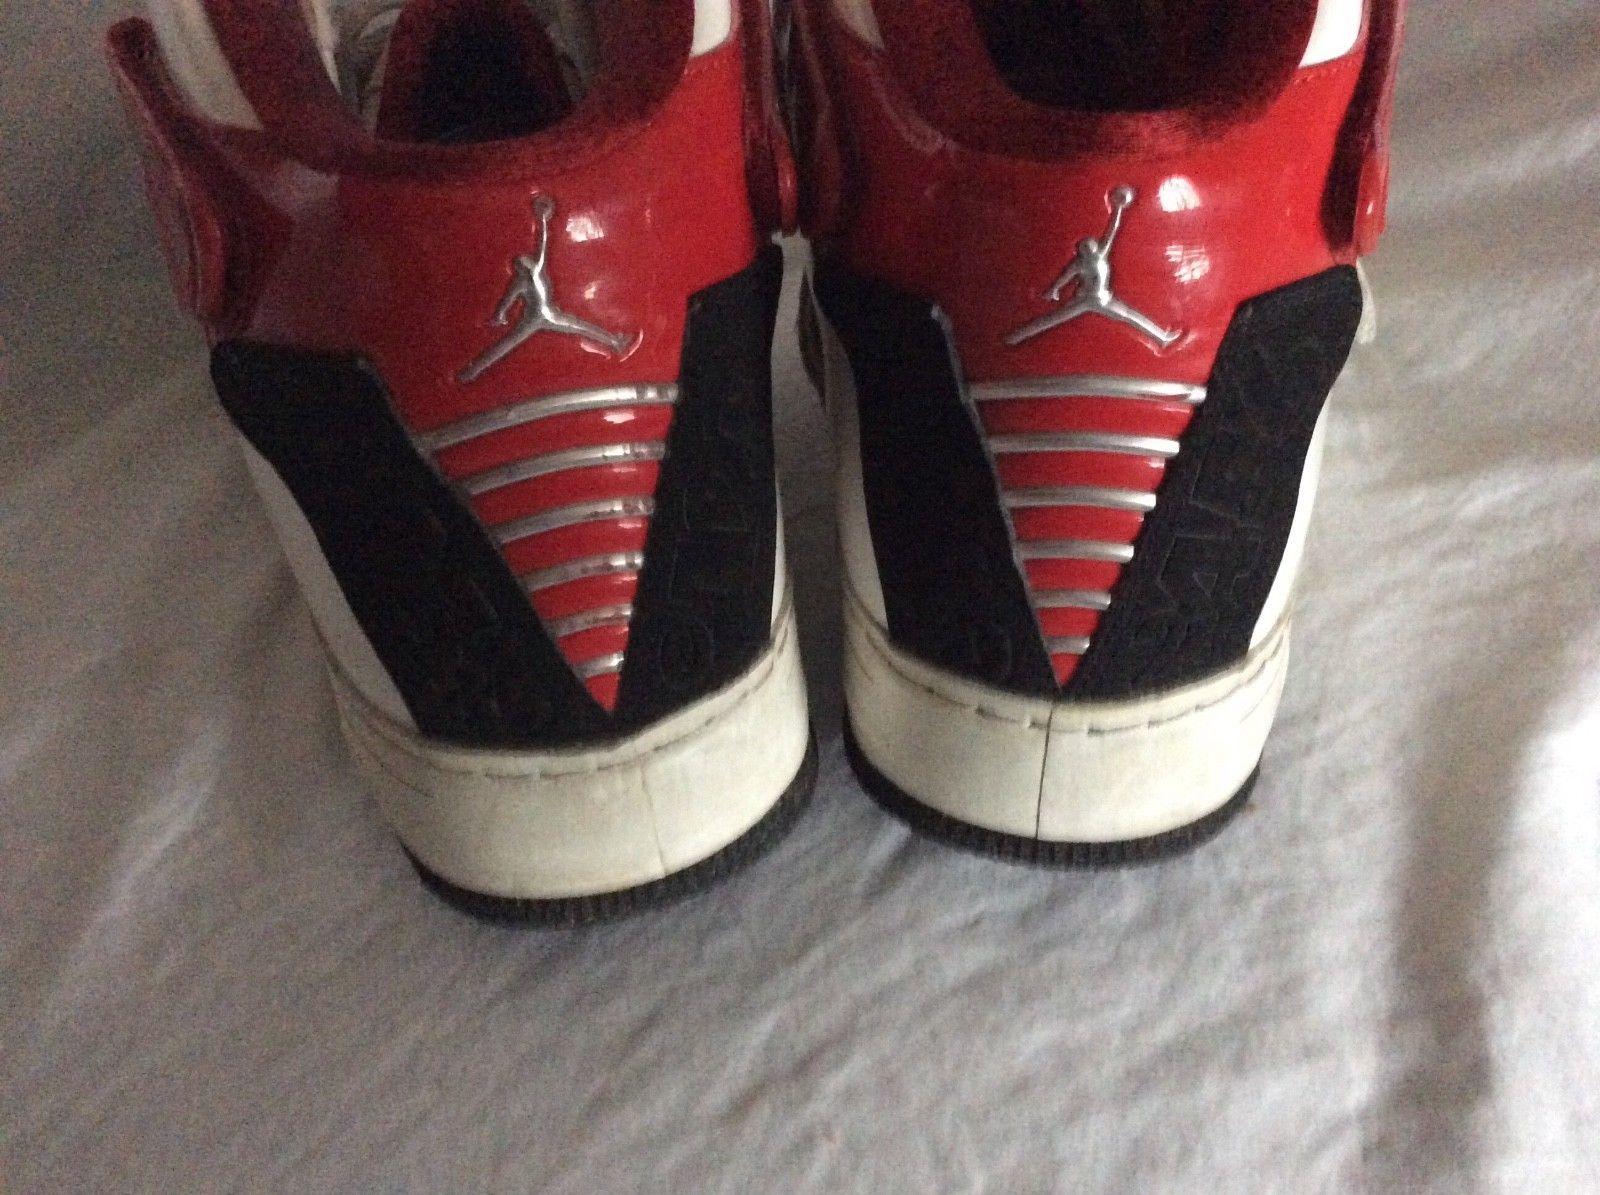 the best attitude 59696 1b07f ... Nike Air Jordan Fusion AJF 20 White Red Black Shoes Sneakers 331823 101  U.S 13 ...